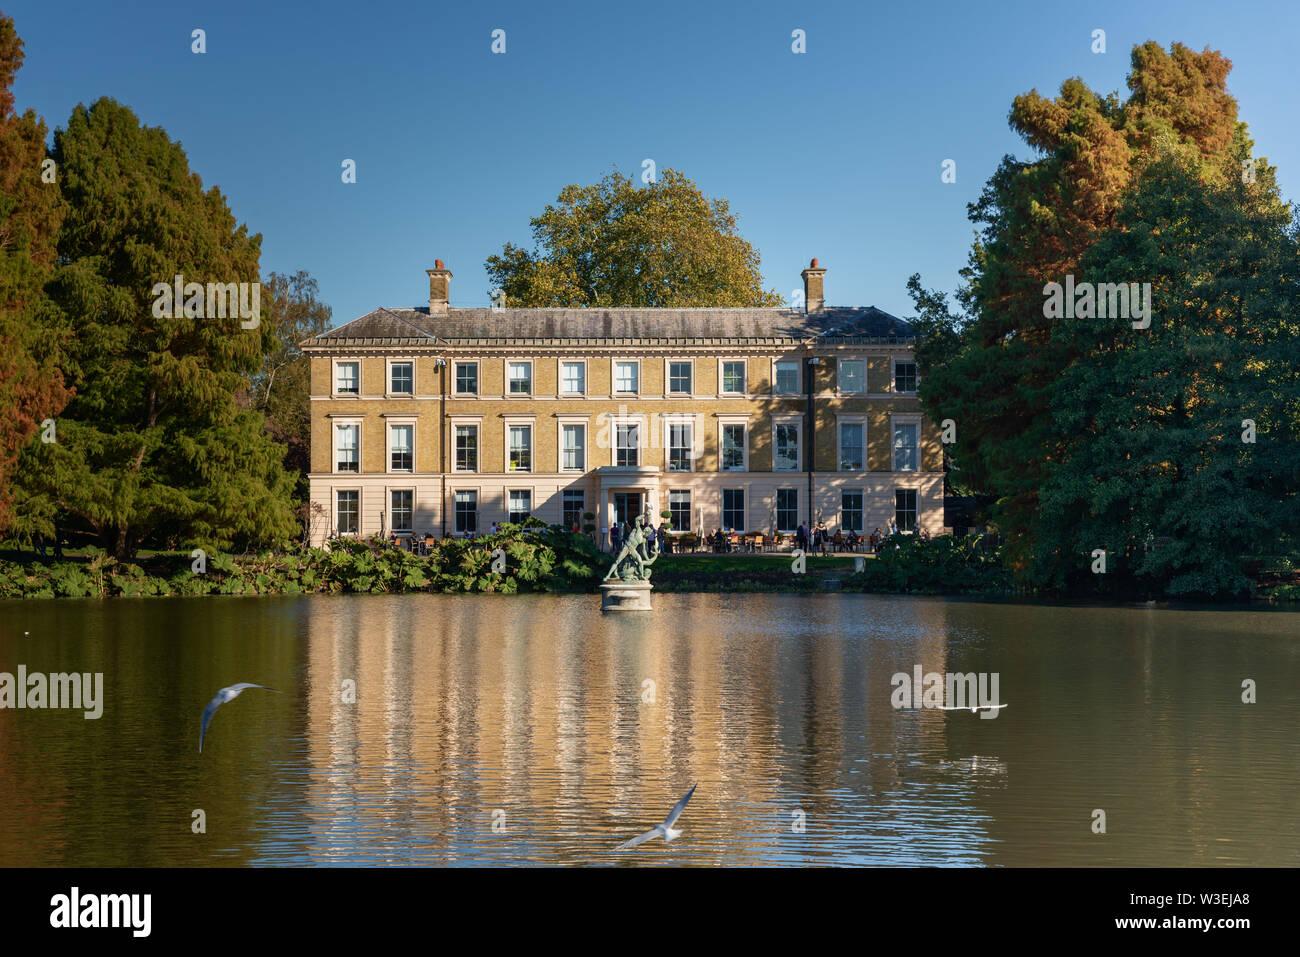 The Botanical, Kew Gardens, London, UK - Stock Image